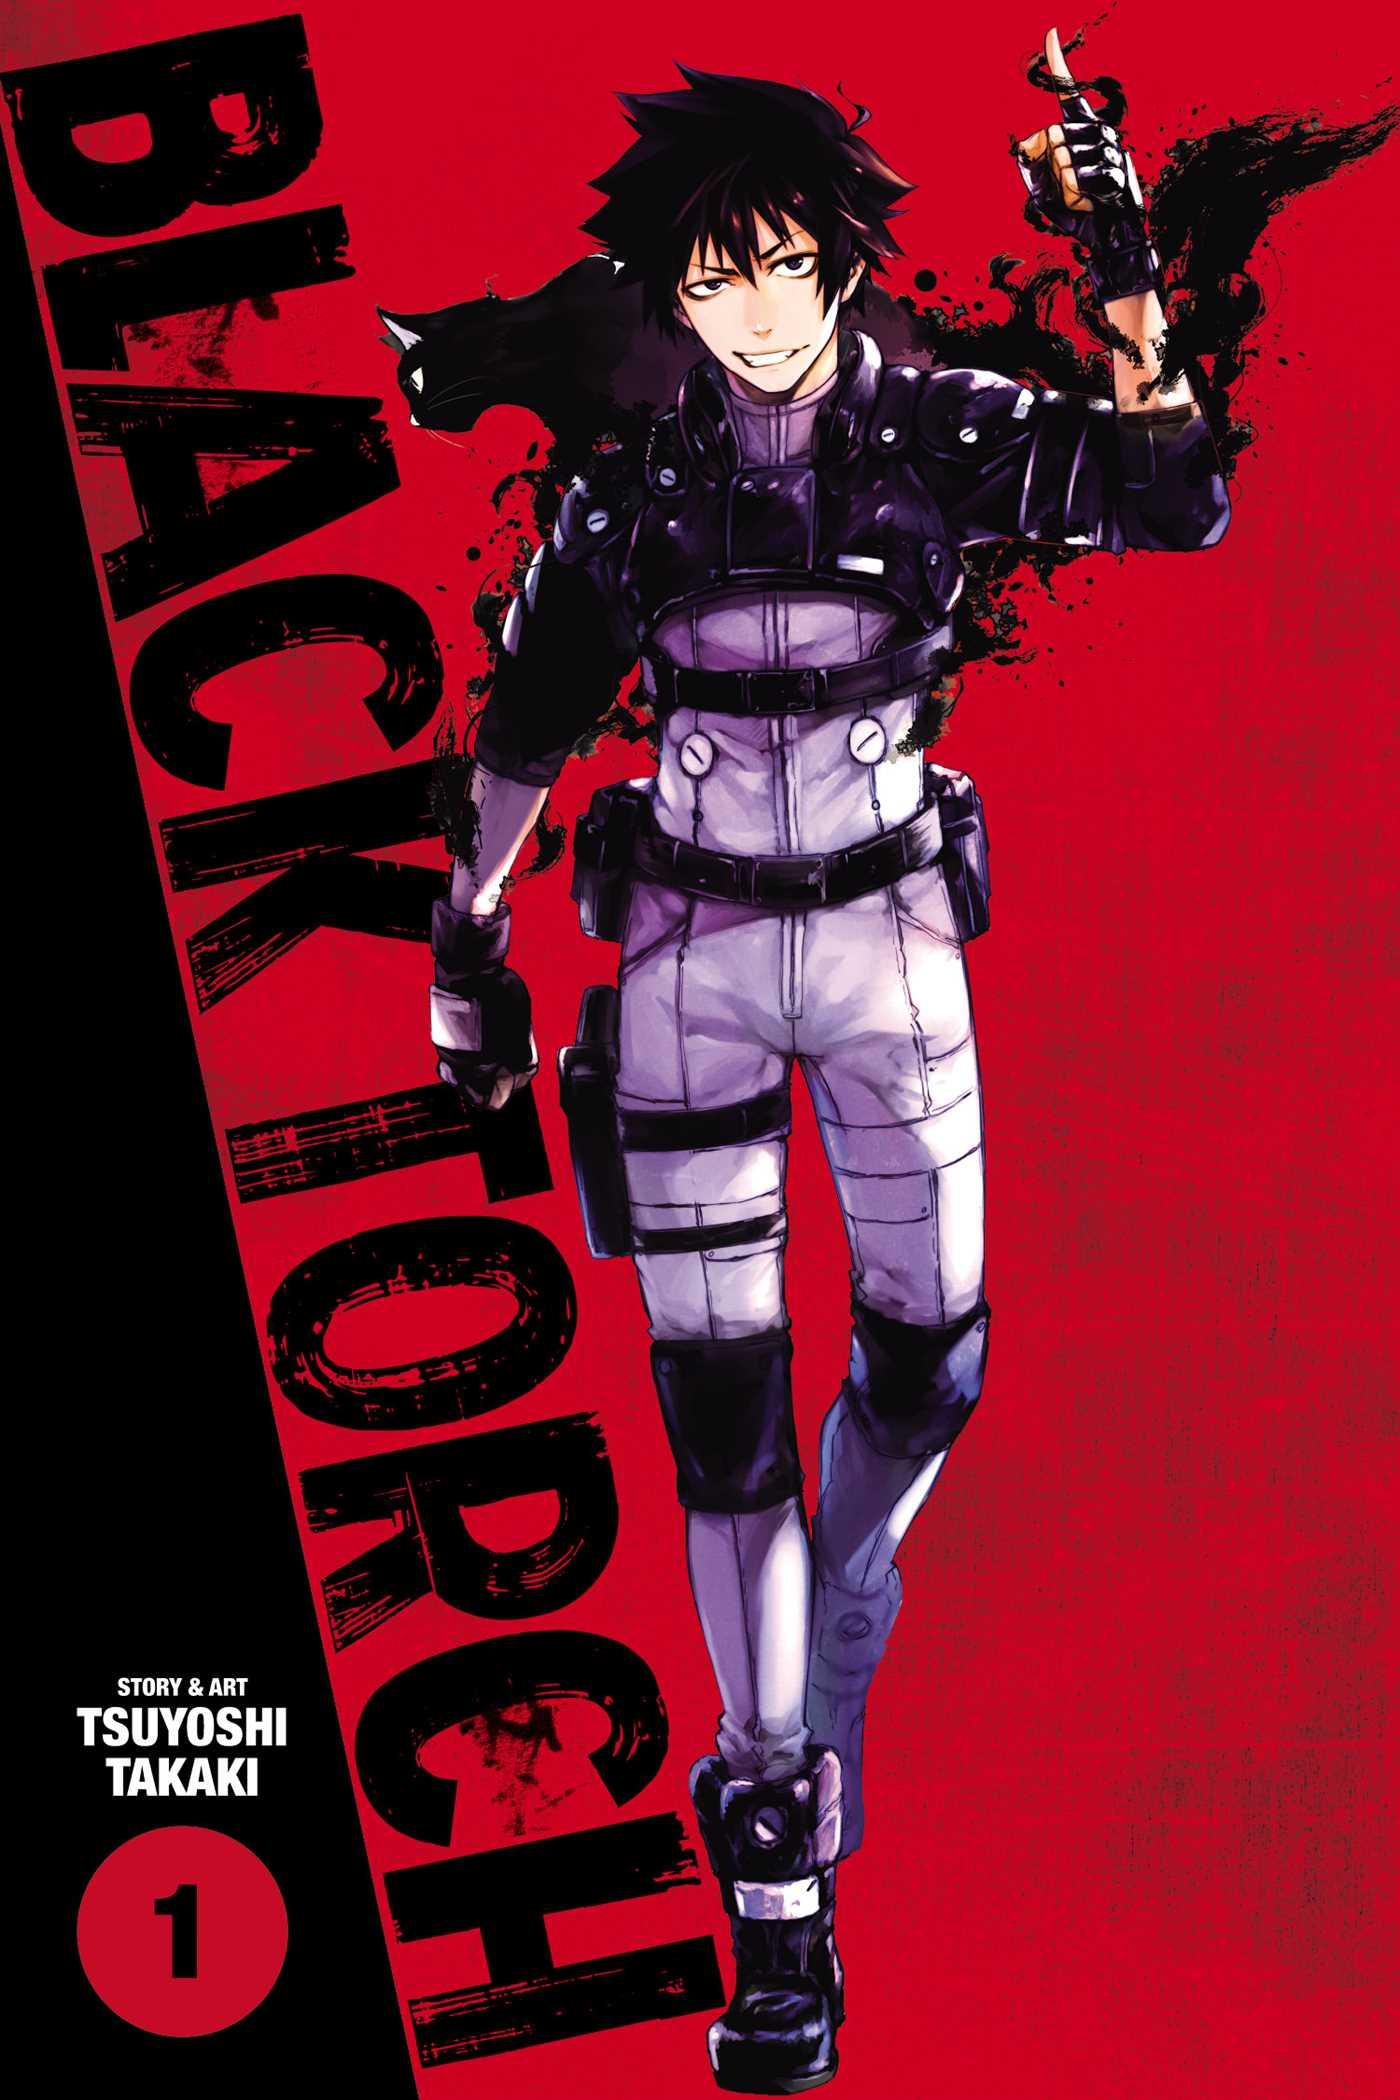 Black Torch, Vol. 1 | Book by Tsuyoshi Takaki | Official